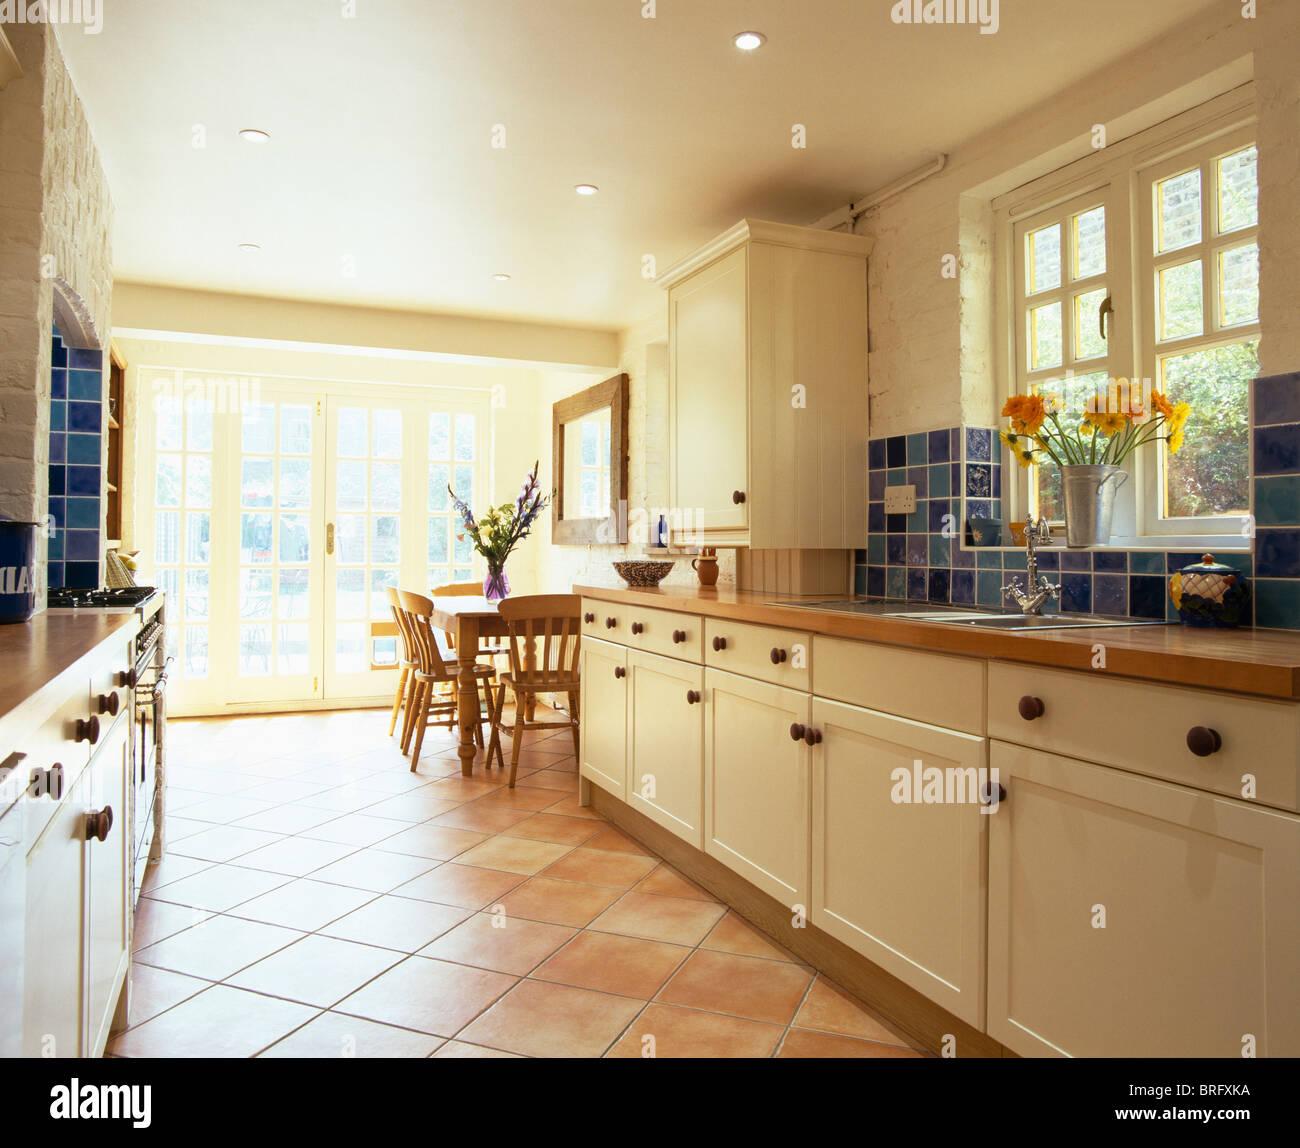 kitchen floor tile ideas white cabinets Bathroom Color Ideas 2018 Bathroom Color Ideas 2018